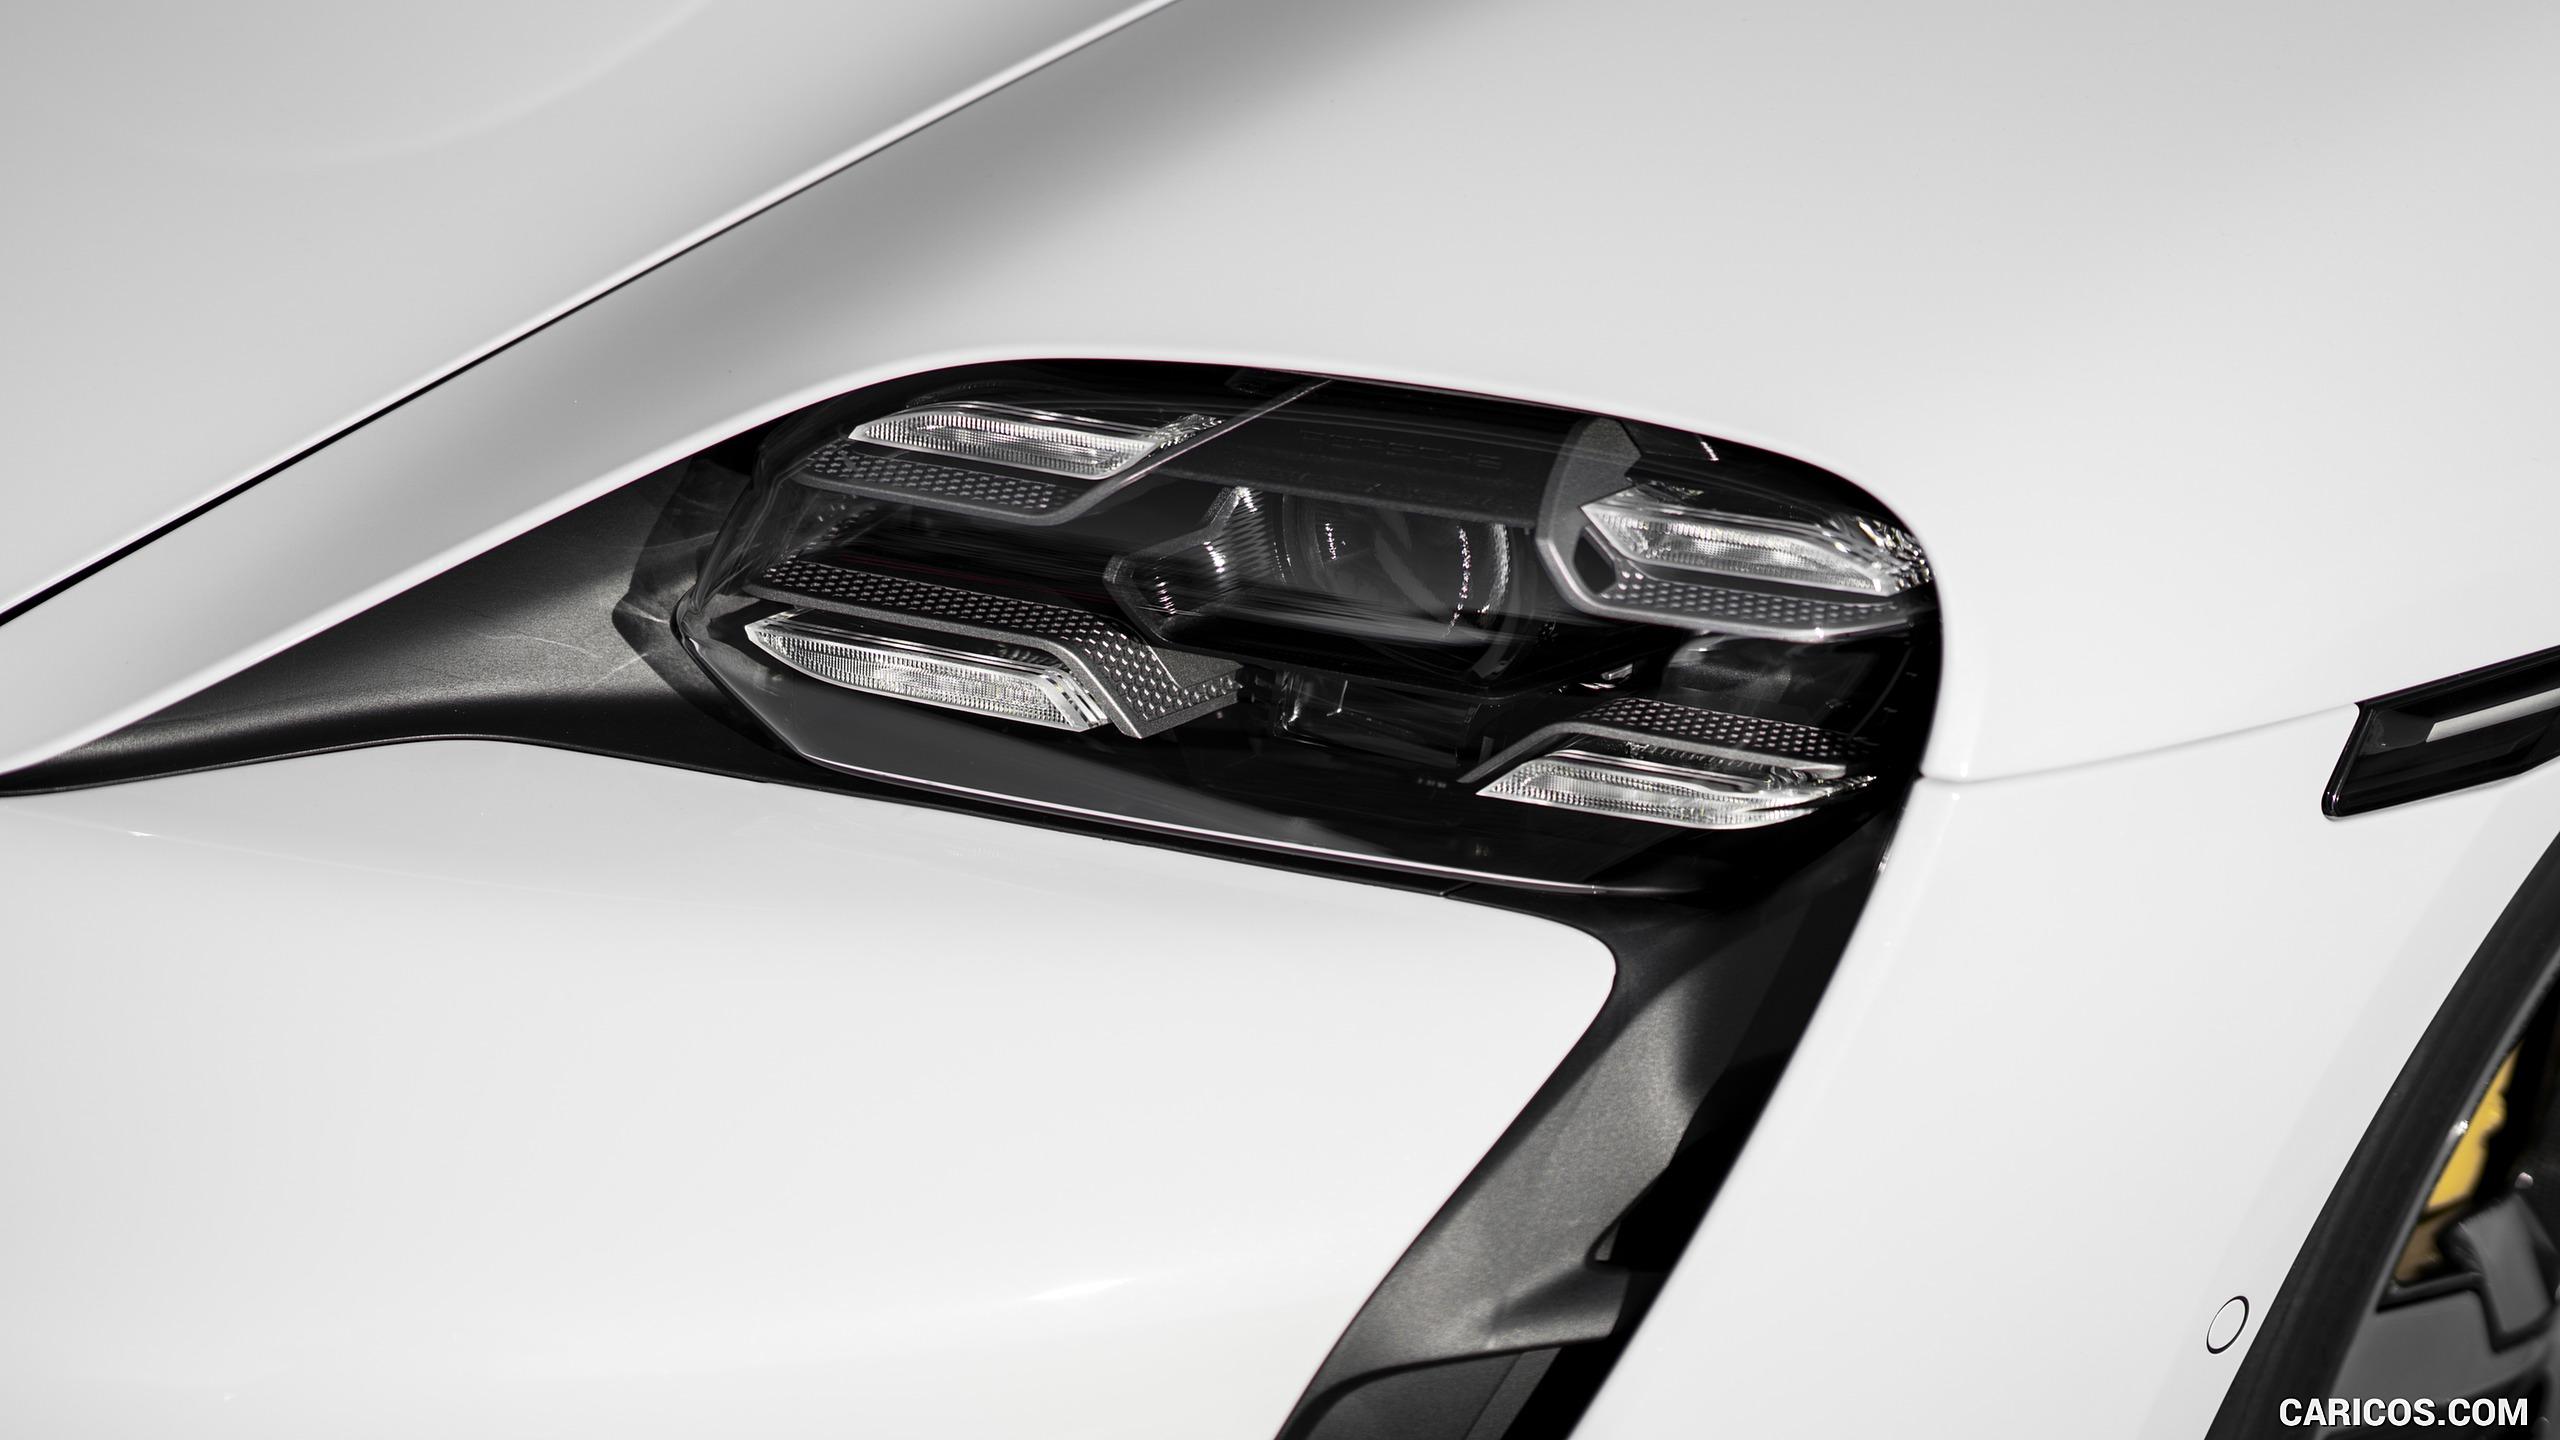 2020 Porsche Taycan Turbo S Color Carrara White Metallic 2560x1440